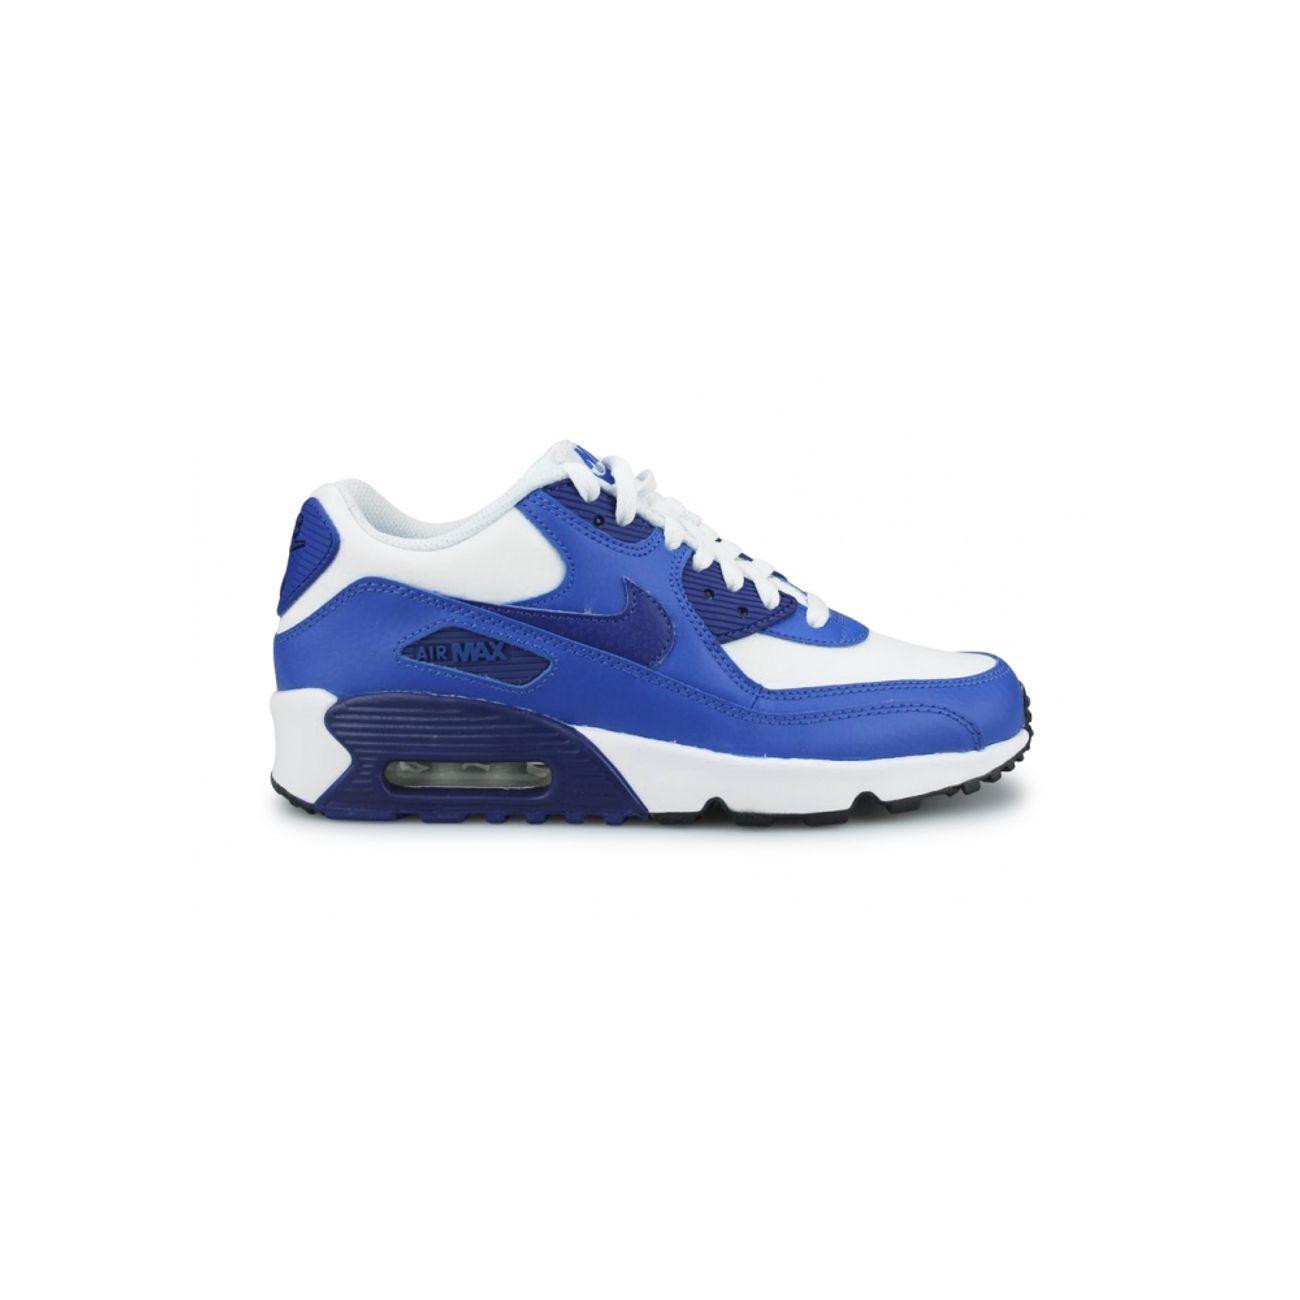 quality design 747ea ce099 Mode- Lifestyle garçon NIKE Basket Nike Air Max 90 Ltr Junior Blanc  833412-105 ...